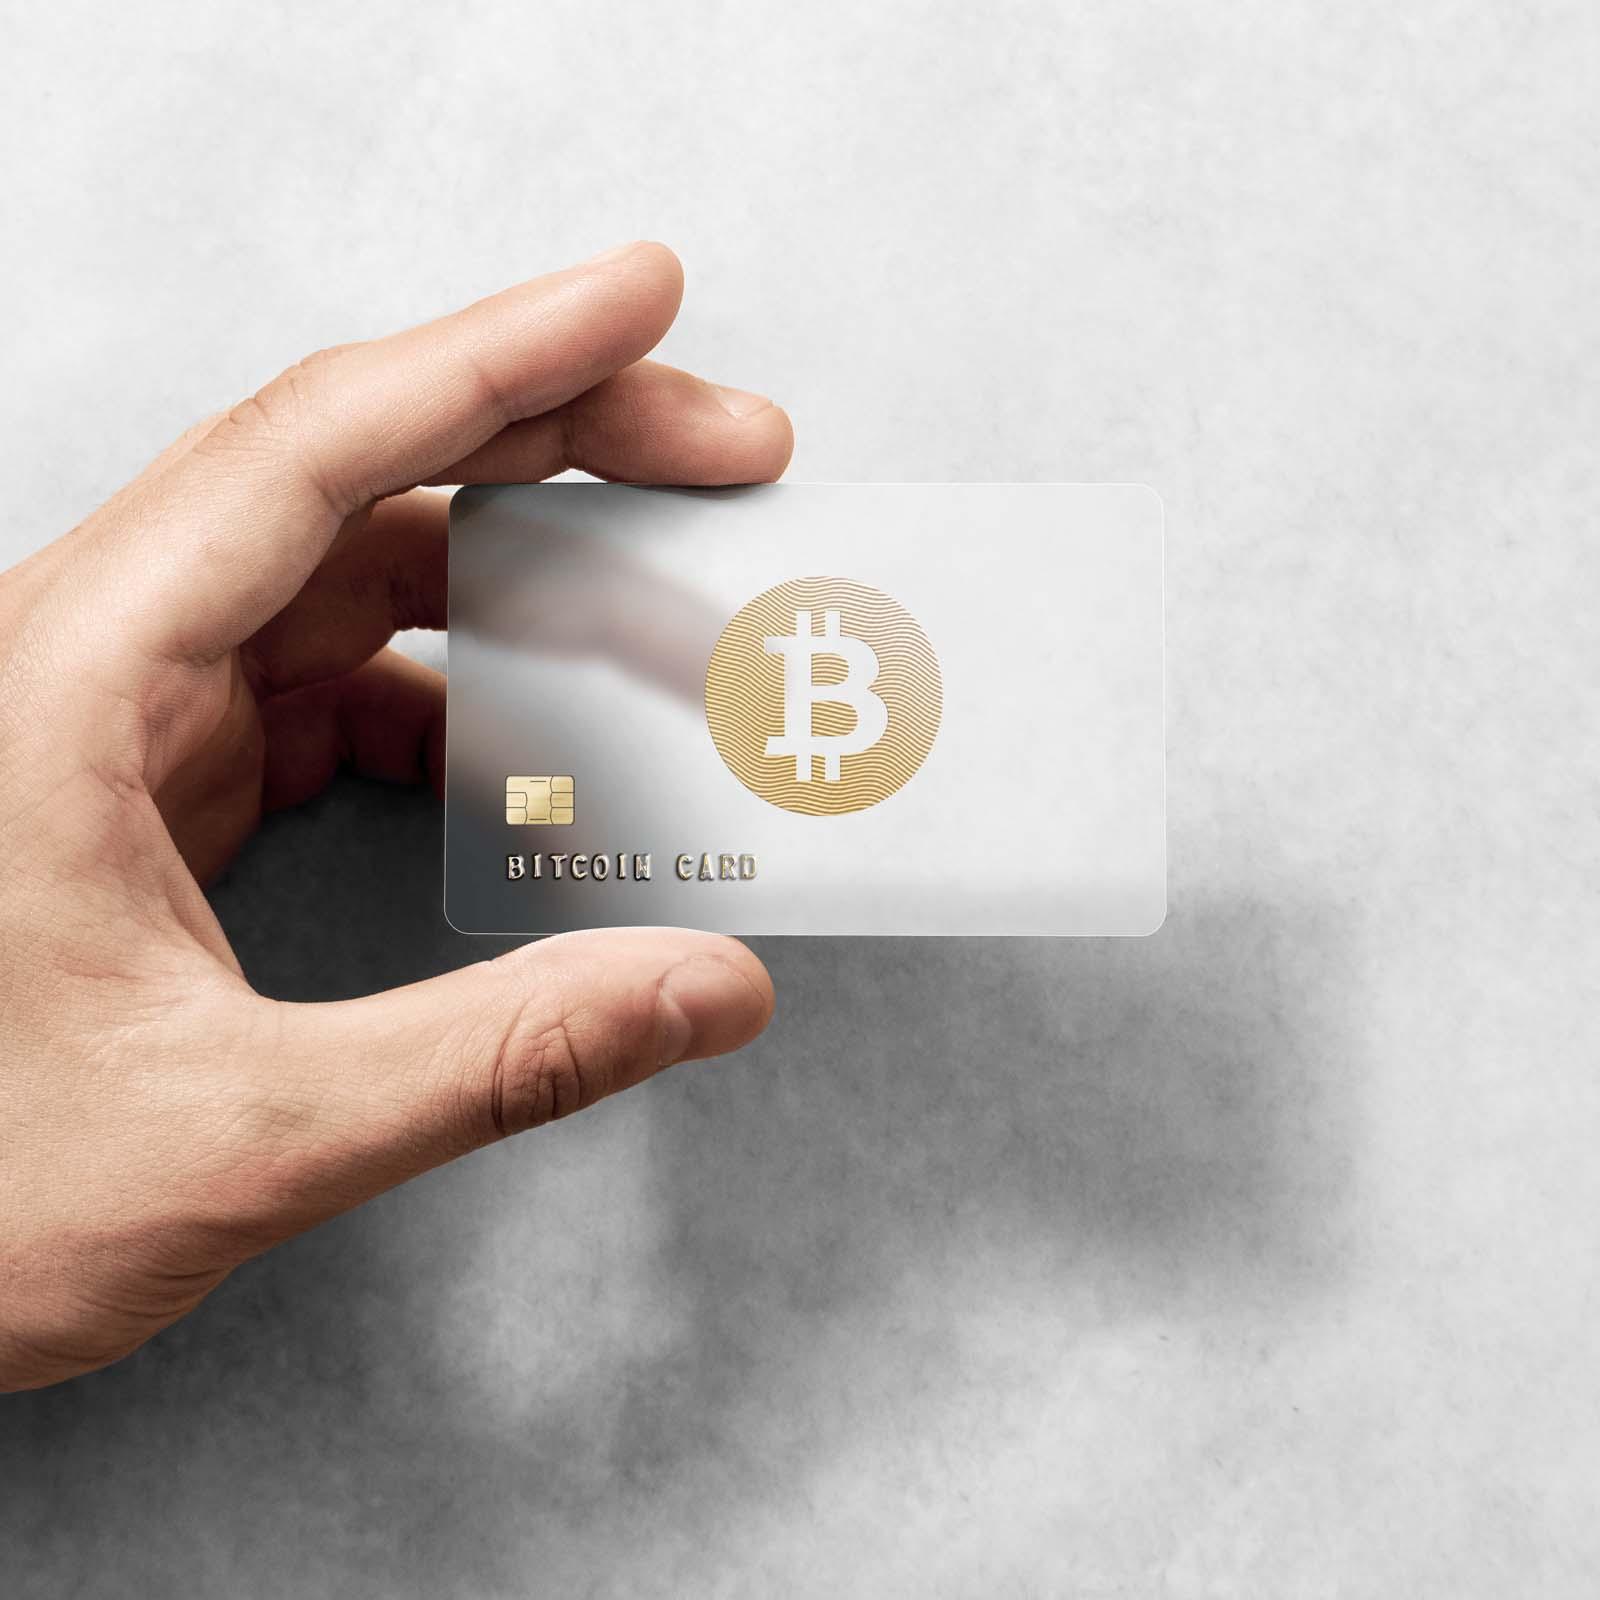 bitcoin card de debit atm)